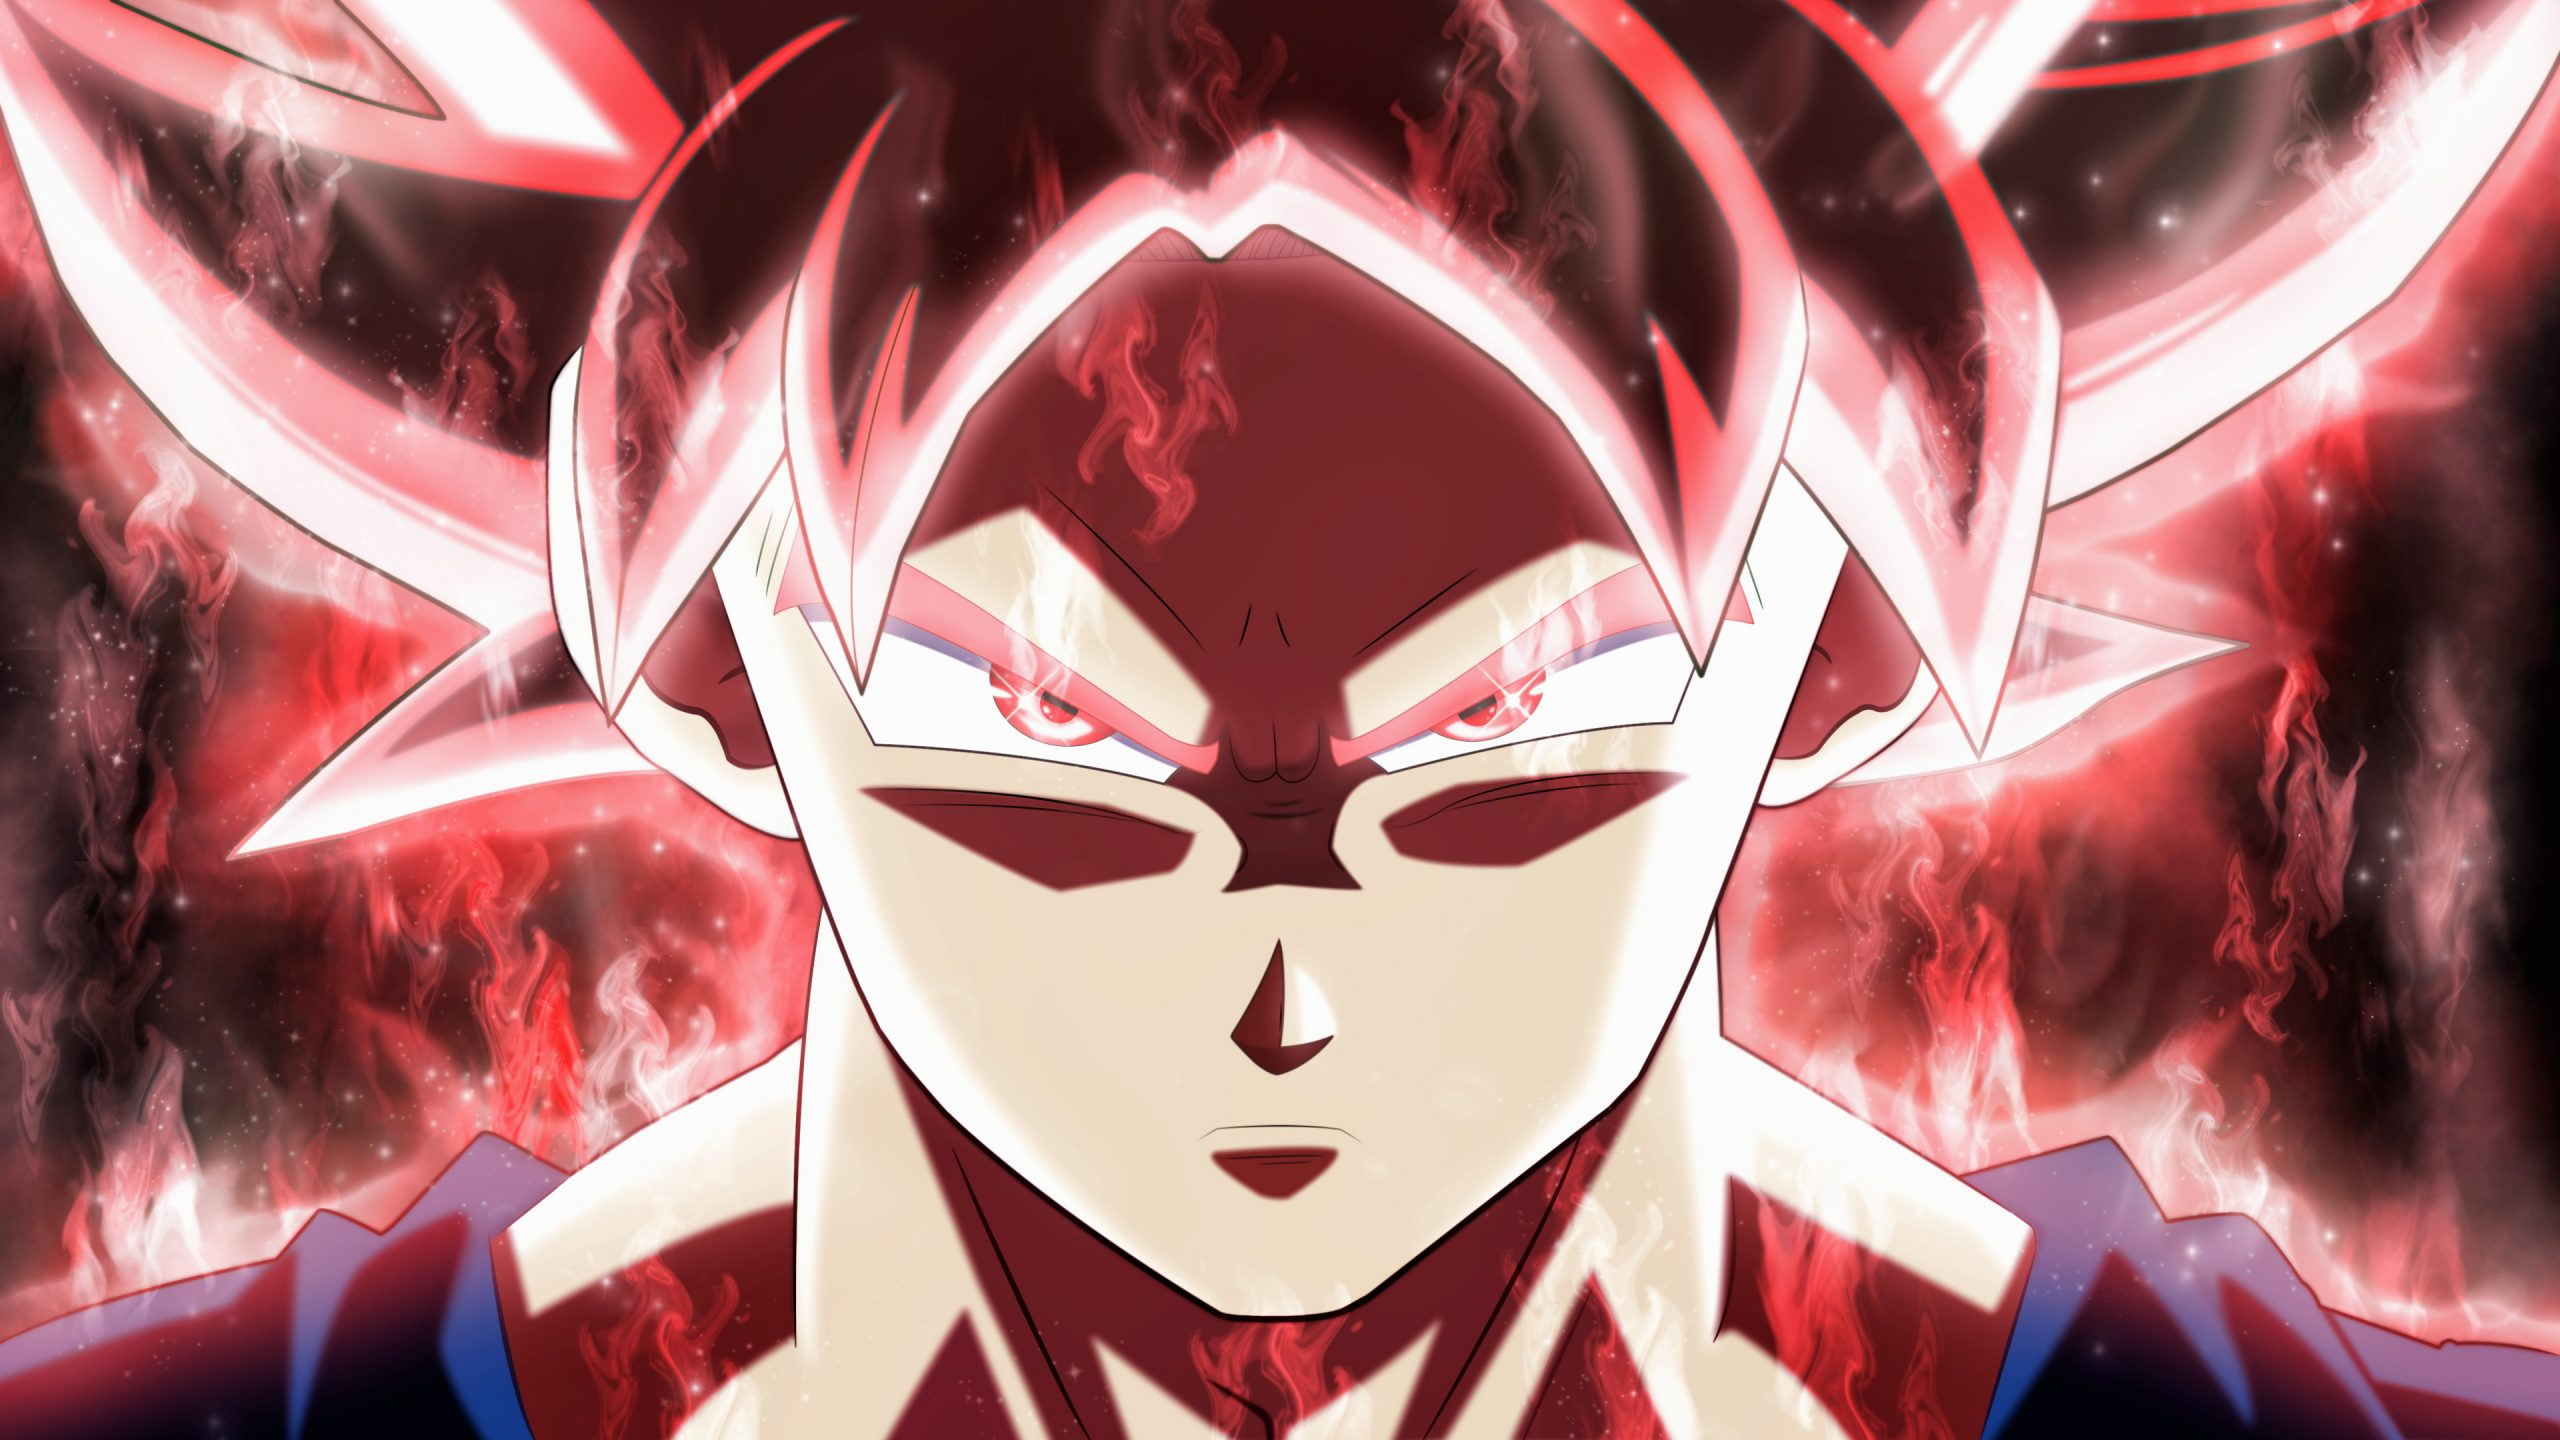 Son Goku In Dragon Ball Super 4k Wallpaper Download High Resolution 4k Wallpaper